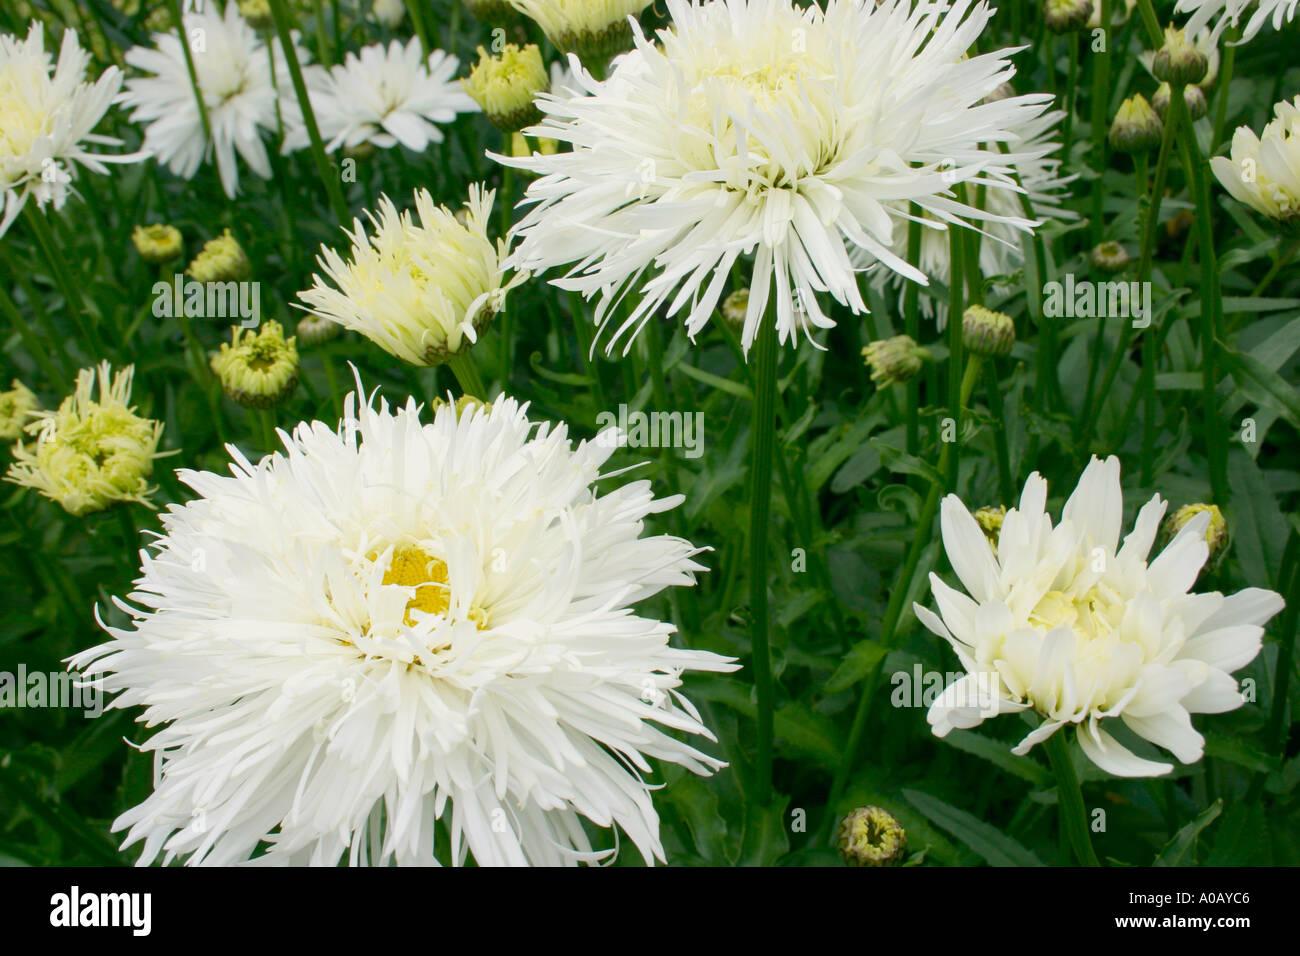 White Flowers Of Garden Plant Leucanthemum X Superbum Common Name